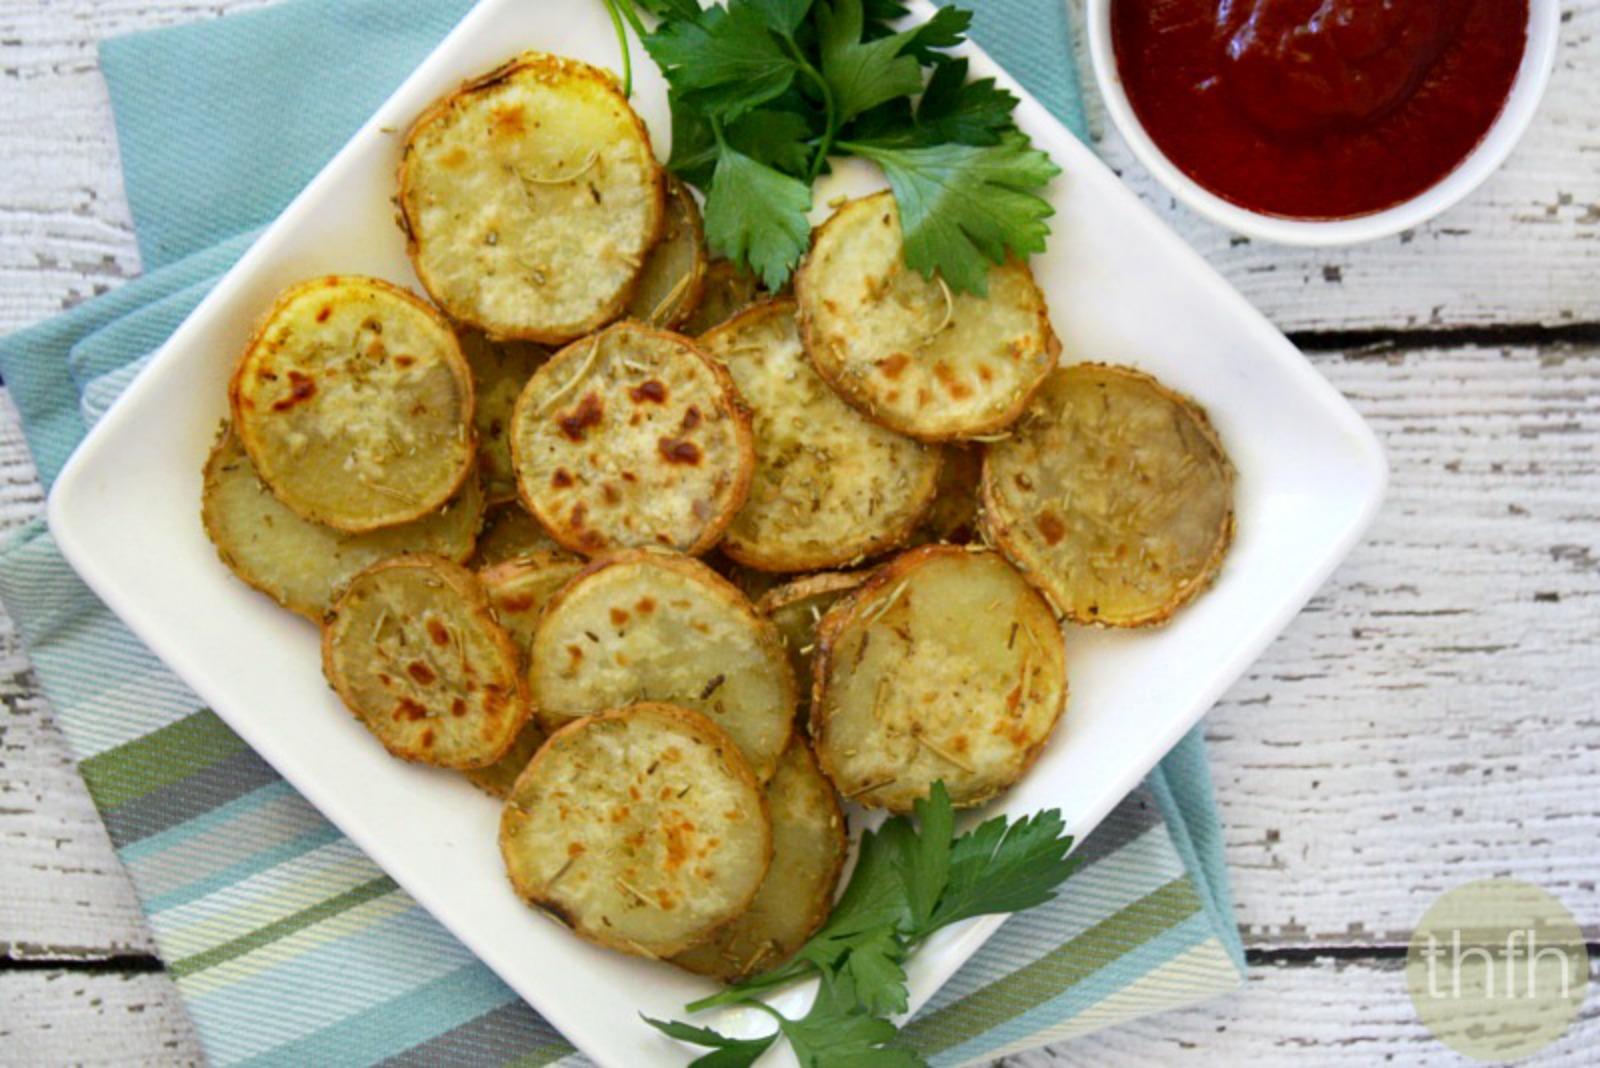 Vegan Rosemary and Garlic Sweet Potato Medallions